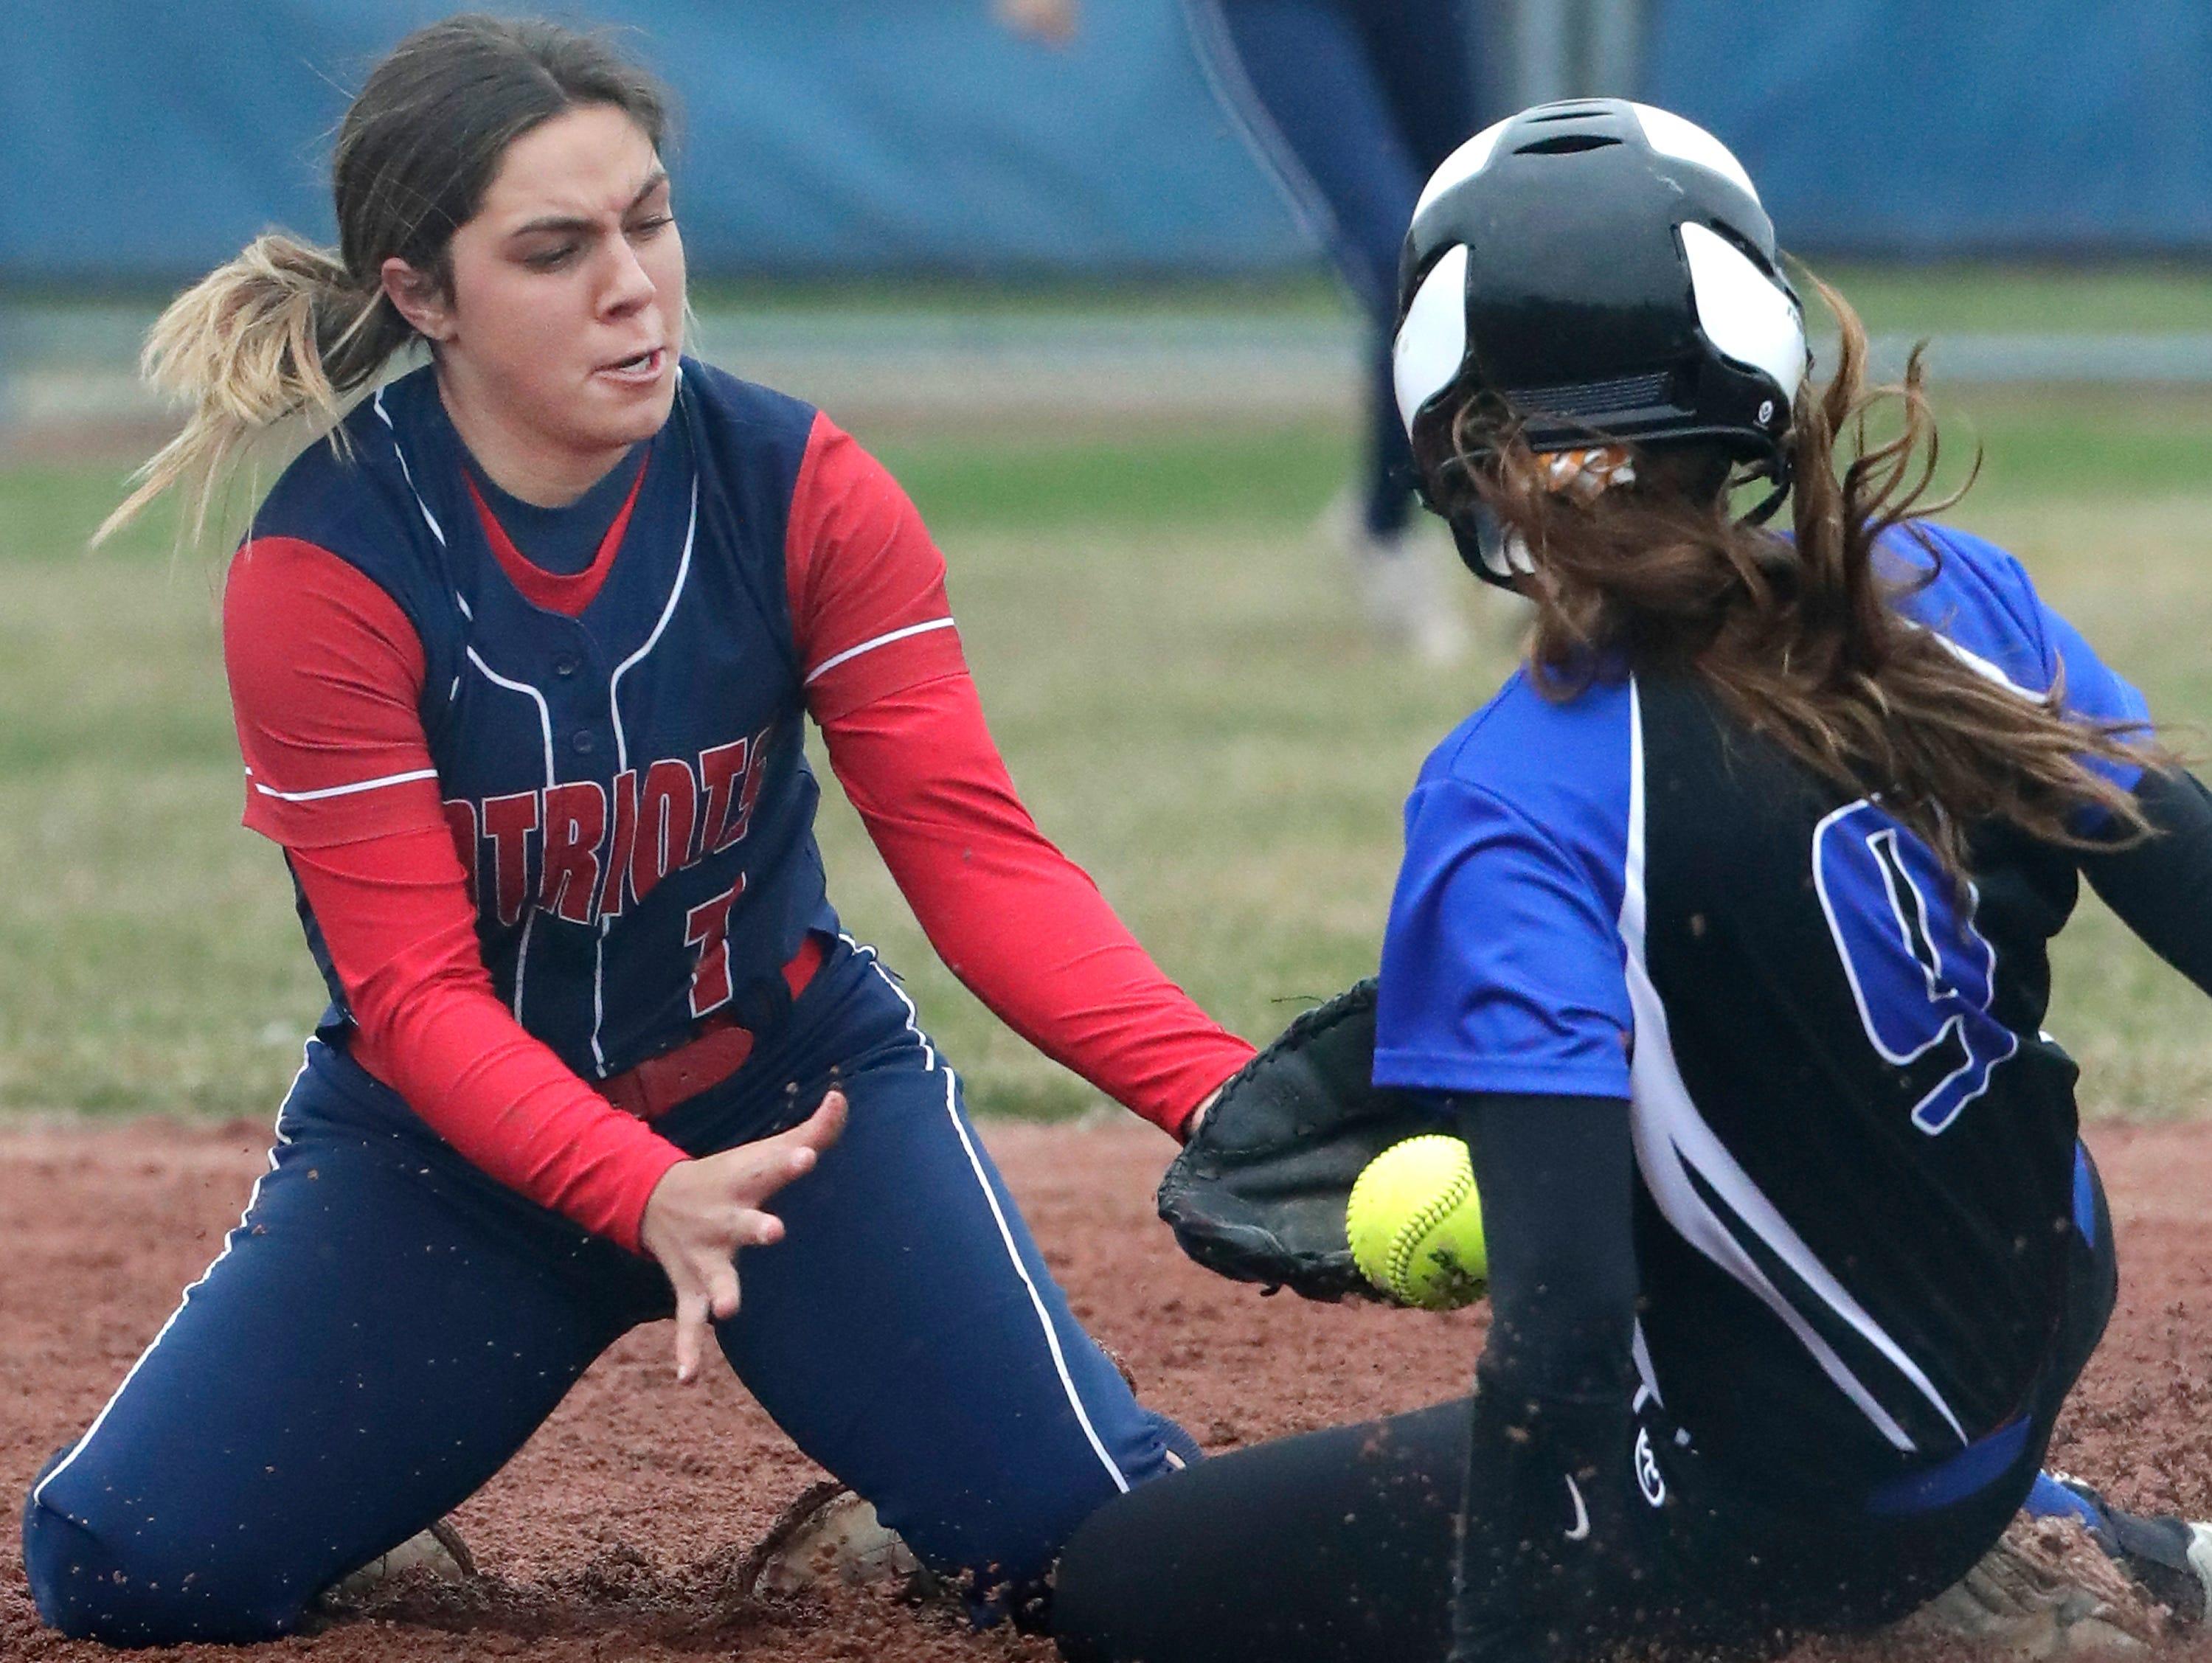 Appleton East High School's #7 Marissa Englemann against Oshkosh West High School's #9 Brieann Kitchen during their softball game  on Thursday, April 18, 2019, in Appleton, Wis. Wm. Glasheen/USA TODAY NETWORK-Wisconsin.